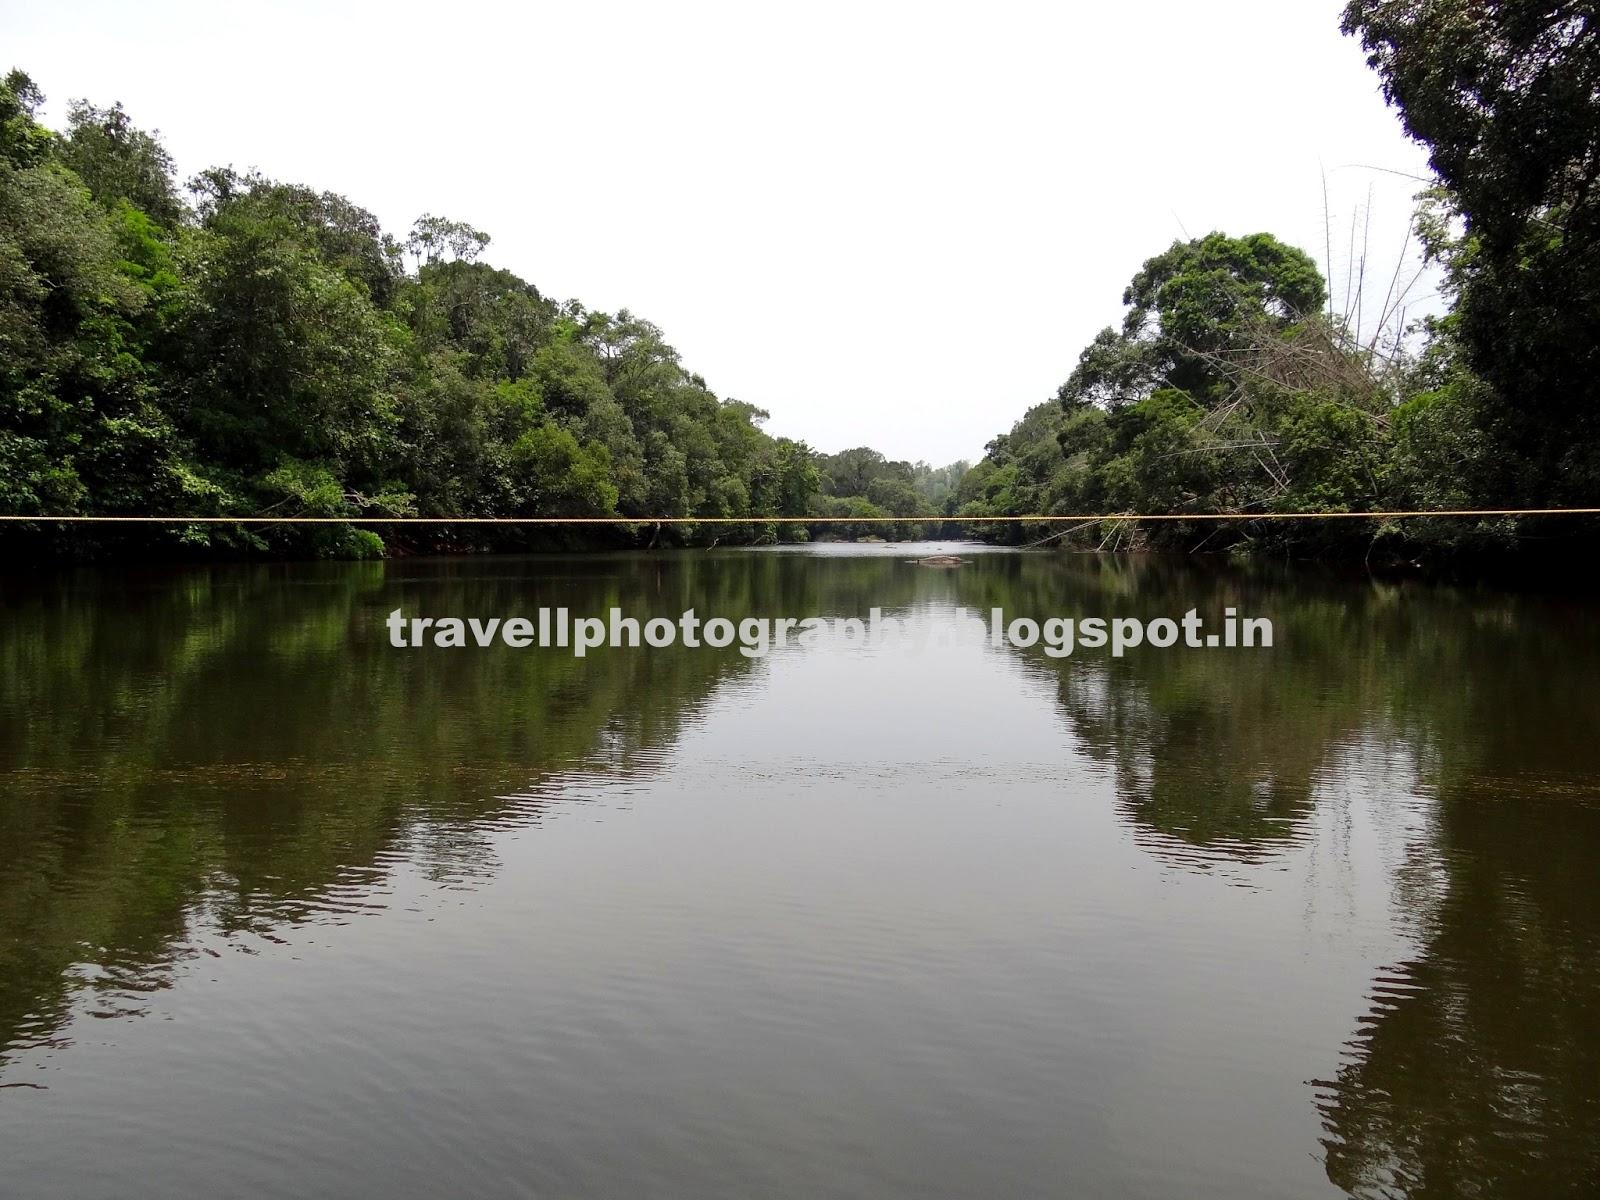 travelphotography kuruva island wayanad kerala